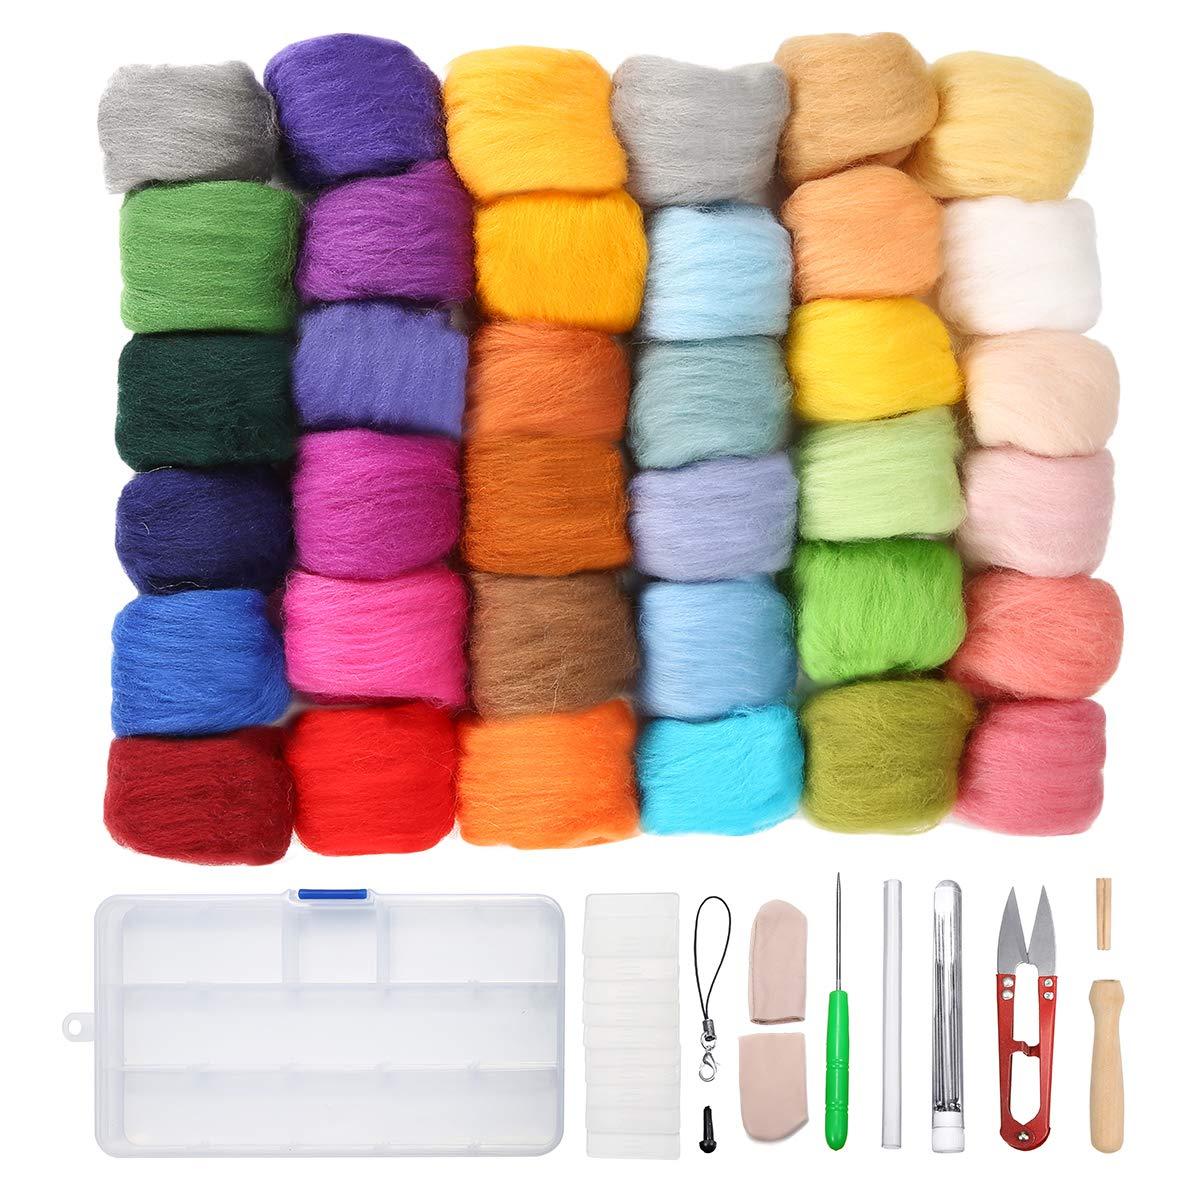 75968dad400cf Jeteven Needle Felting Starter Kit Set, 36 Colours Needle Felting ...